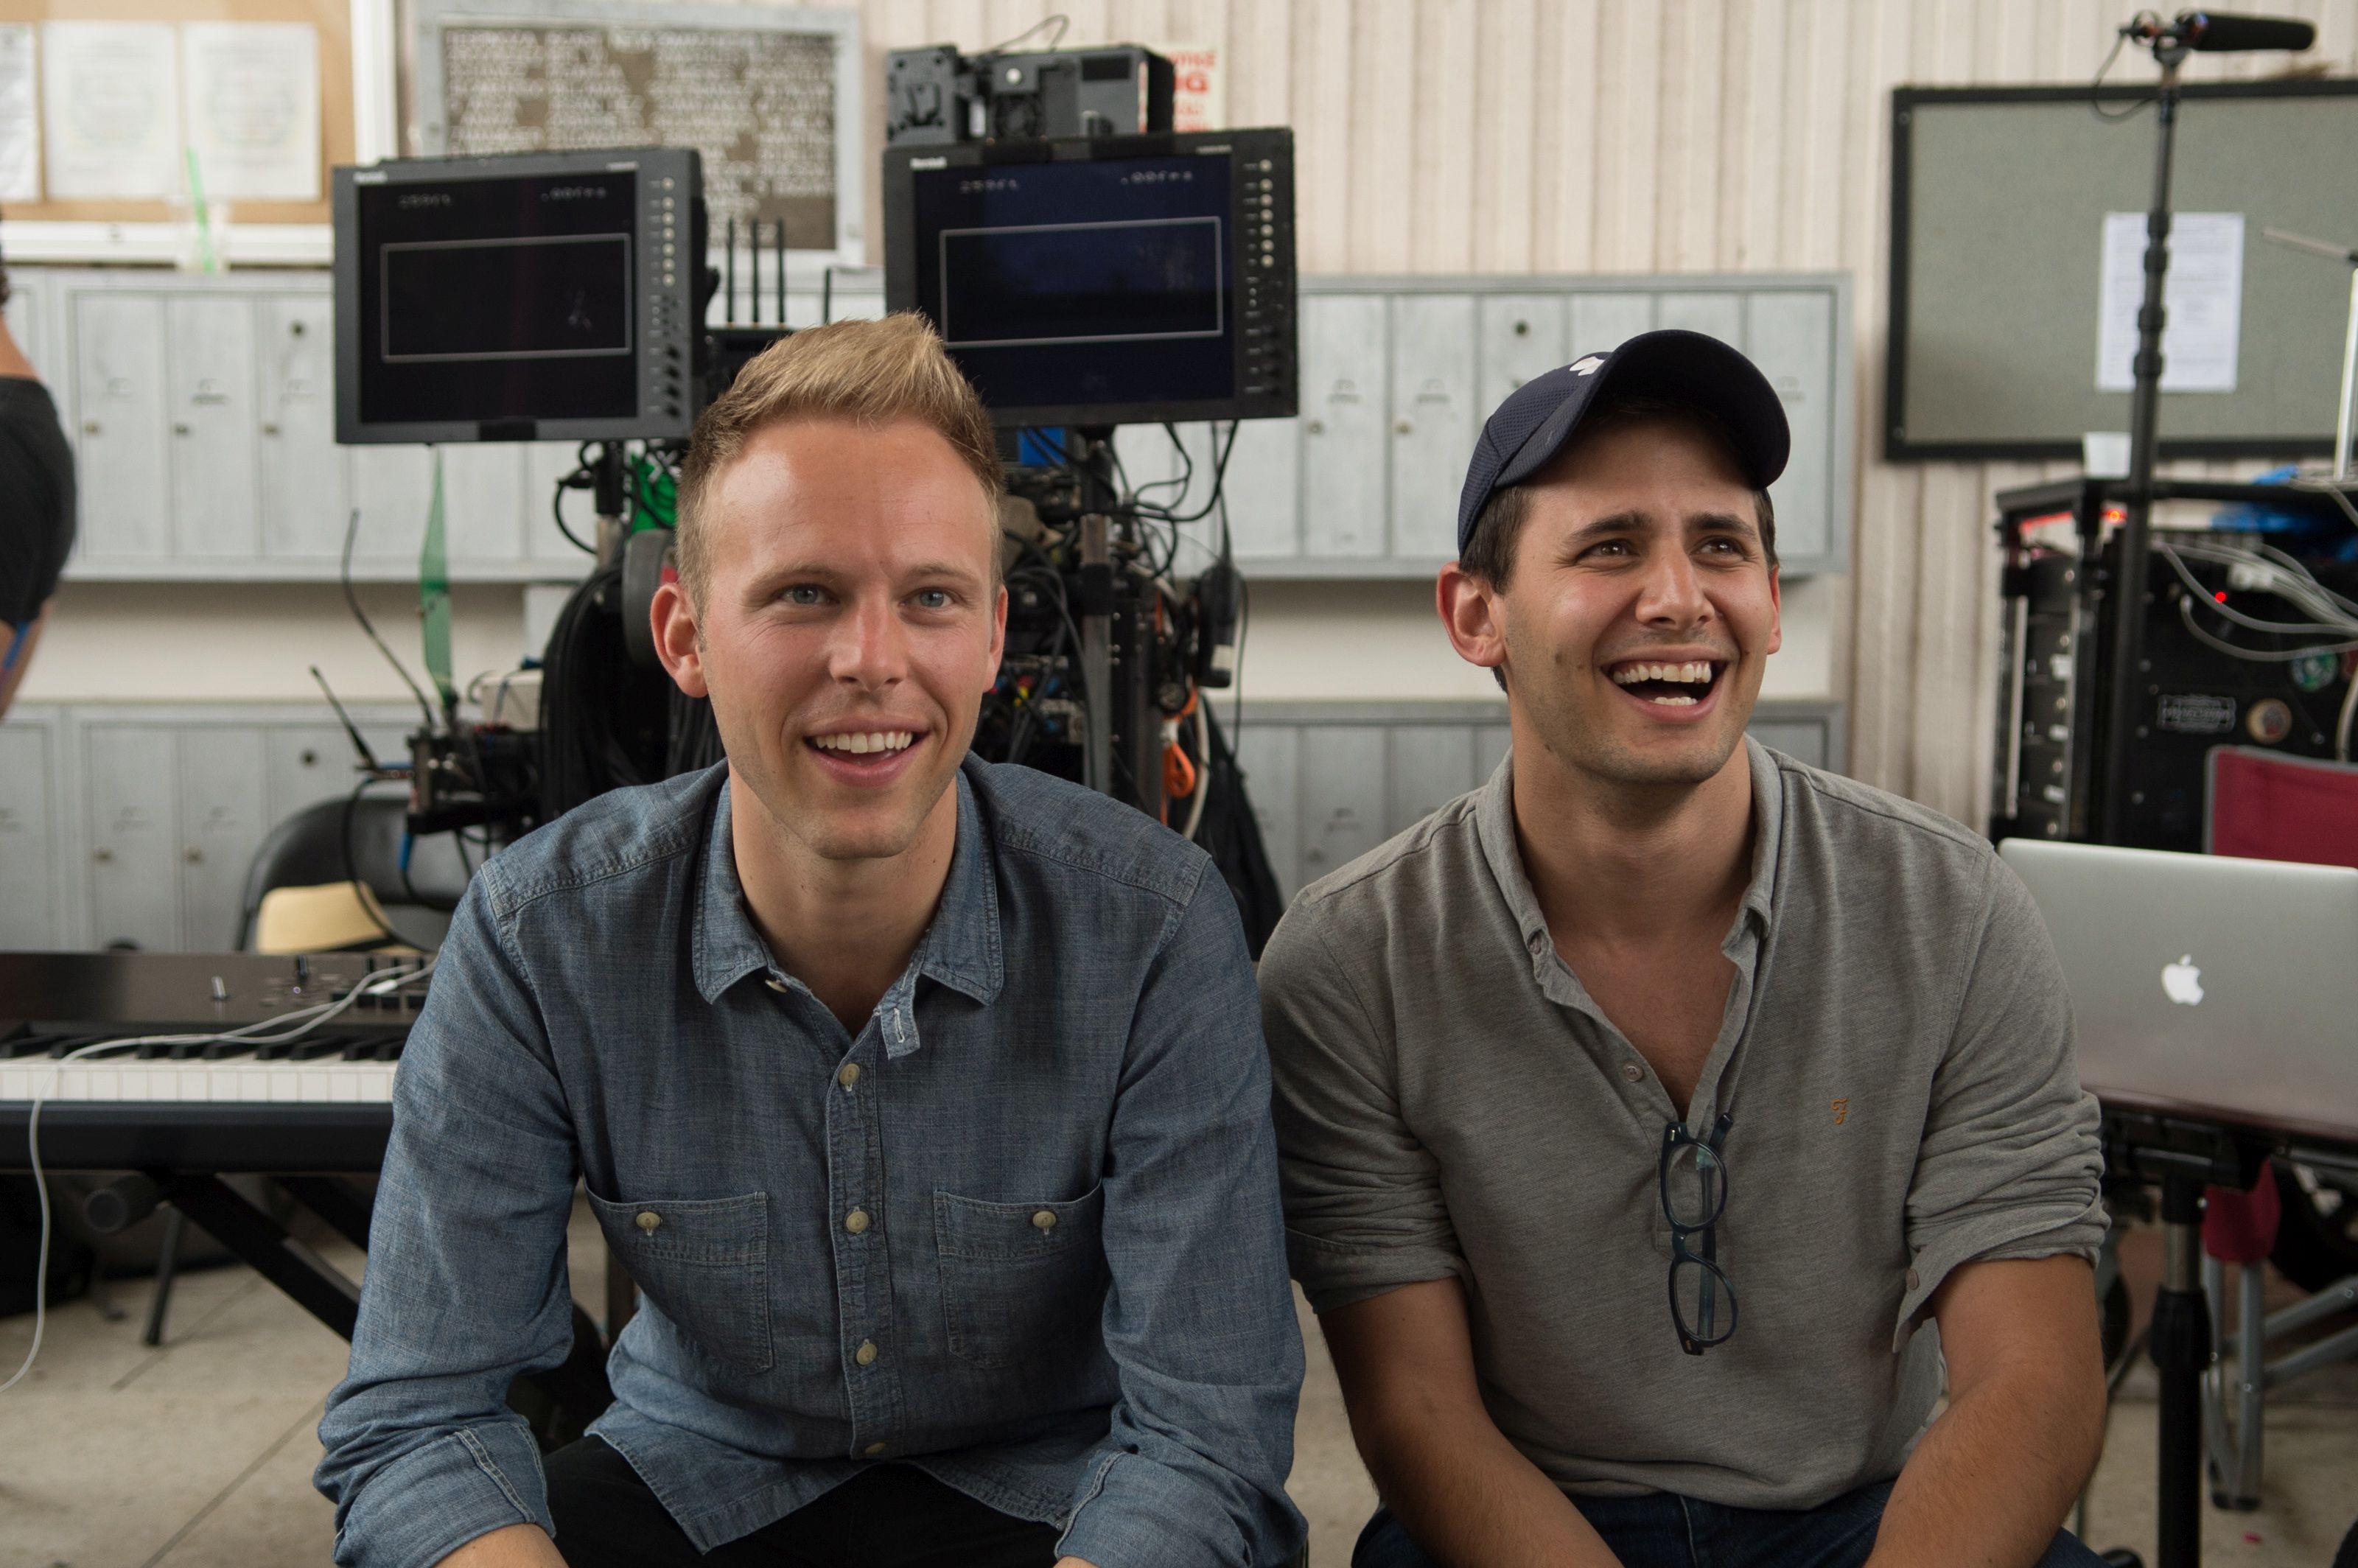 Benj Pasek and Justin Paul on the set of La La Land.